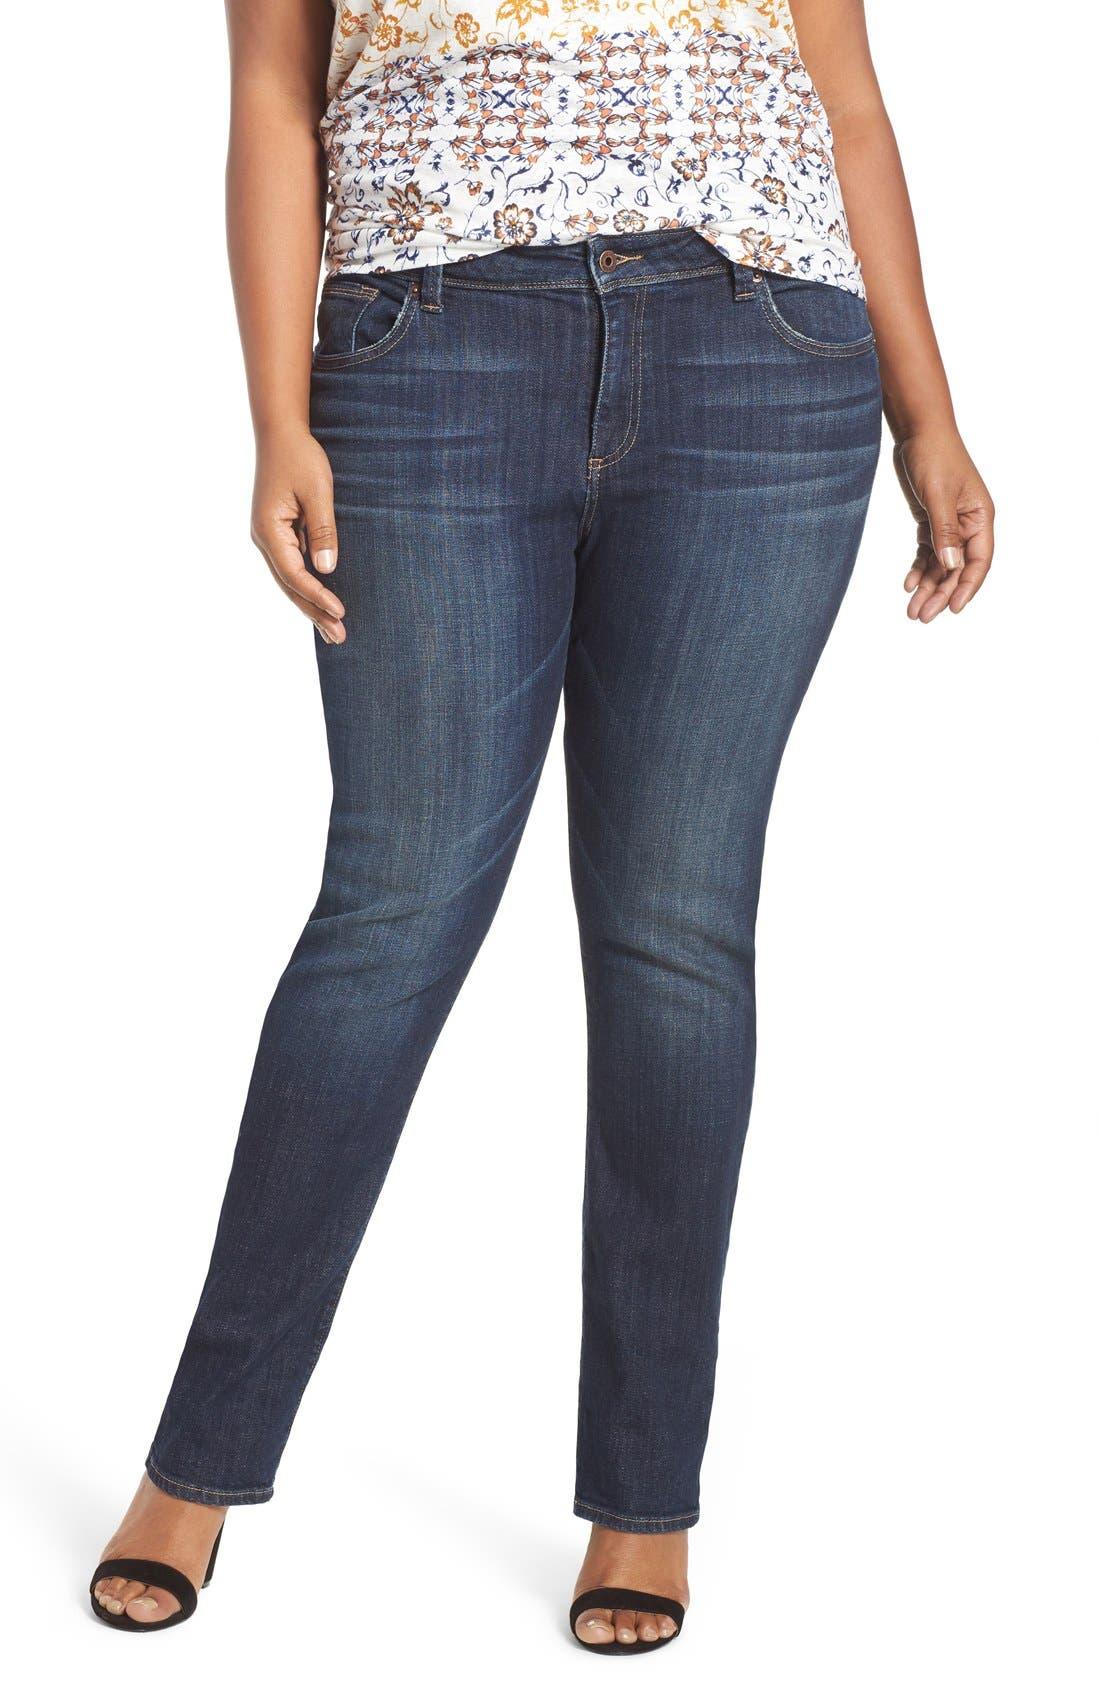 Main Image - Lucky Brand 'Reese' Ripped Boyfriend Jeans (Matira) (Plus Size)